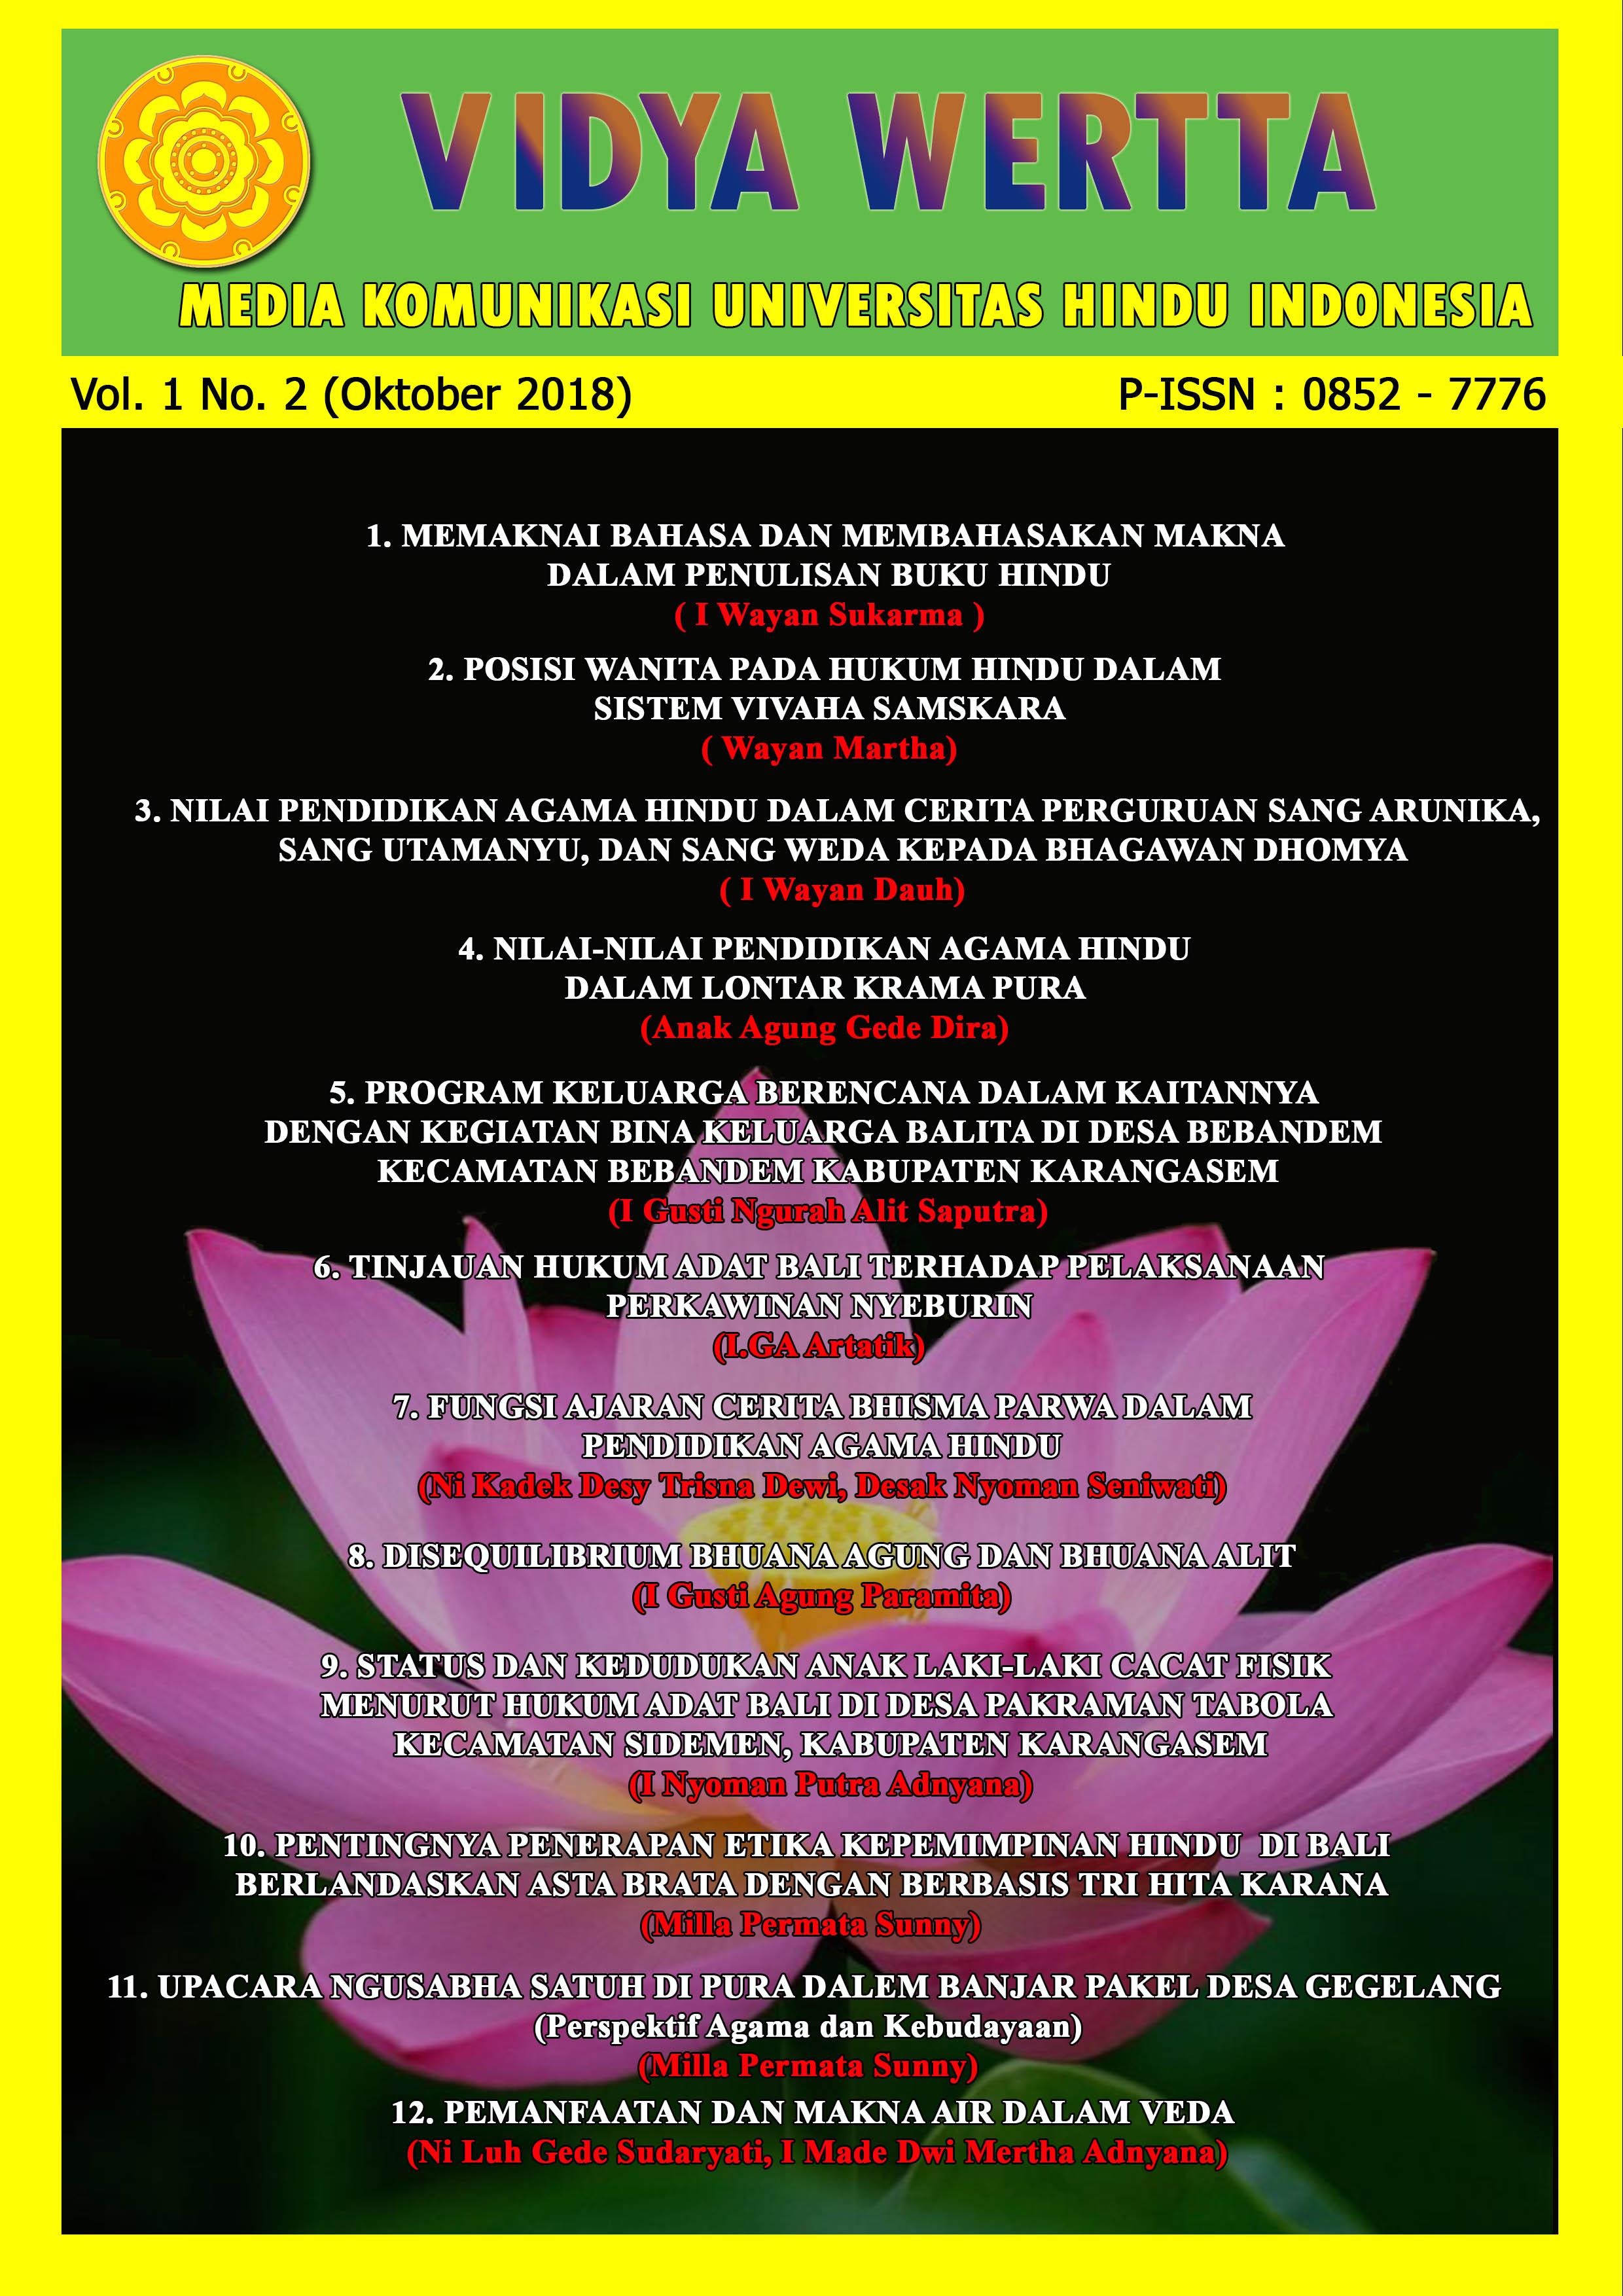 Jurnal Vidya Wertta diterbitkan oleh Fakultas Ilmu Agama dan Kebudayaan Universitas Hindu Indonesia. Terbit dua kali dalam setahun yakni bulan April dan Oktober. Fokus dan jangkauan isu yang diangkat dalam Jurnal Vidya Wertta meliputi agama, filsafat, hukum agama dan kebudayaan.